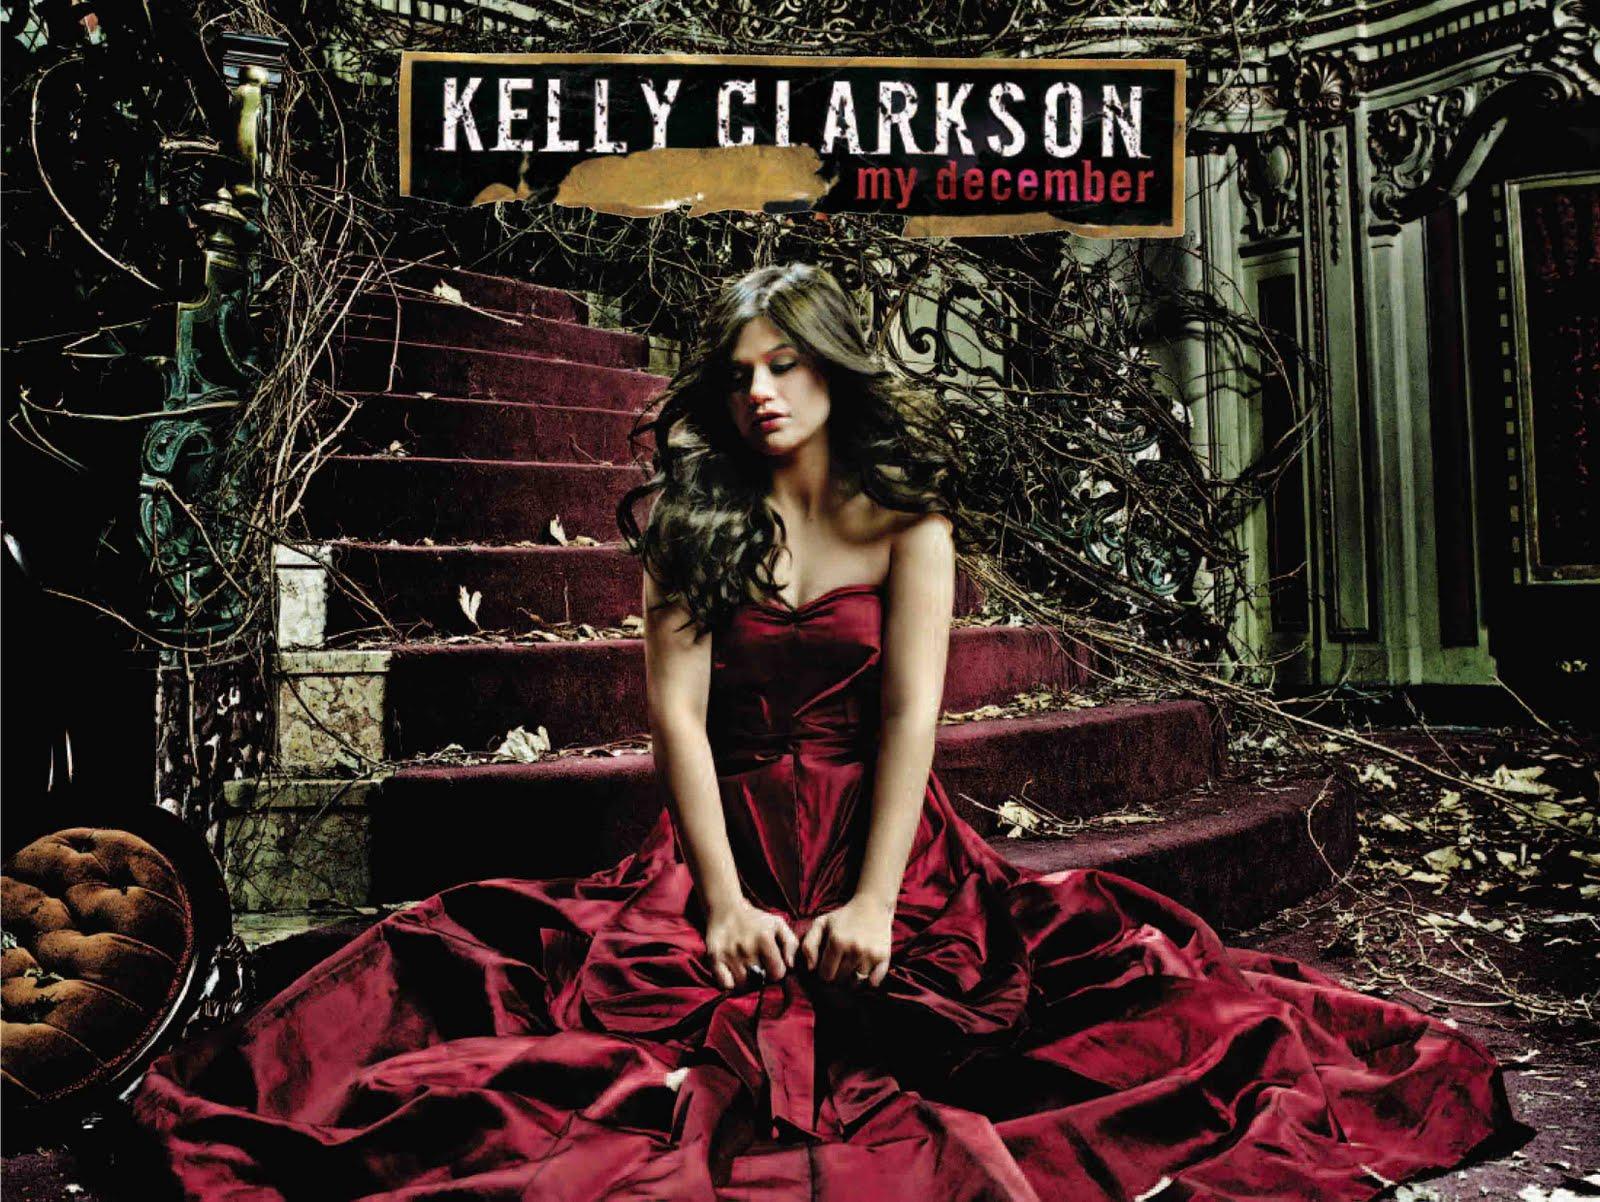 http://1.bp.blogspot.com/_bVGv67RDQ04/TQkk1O-767I/AAAAAAAAAbI/y3UvRpTsT_w/s1600/Kelly+Clarkson+-+My+December-1.jpg